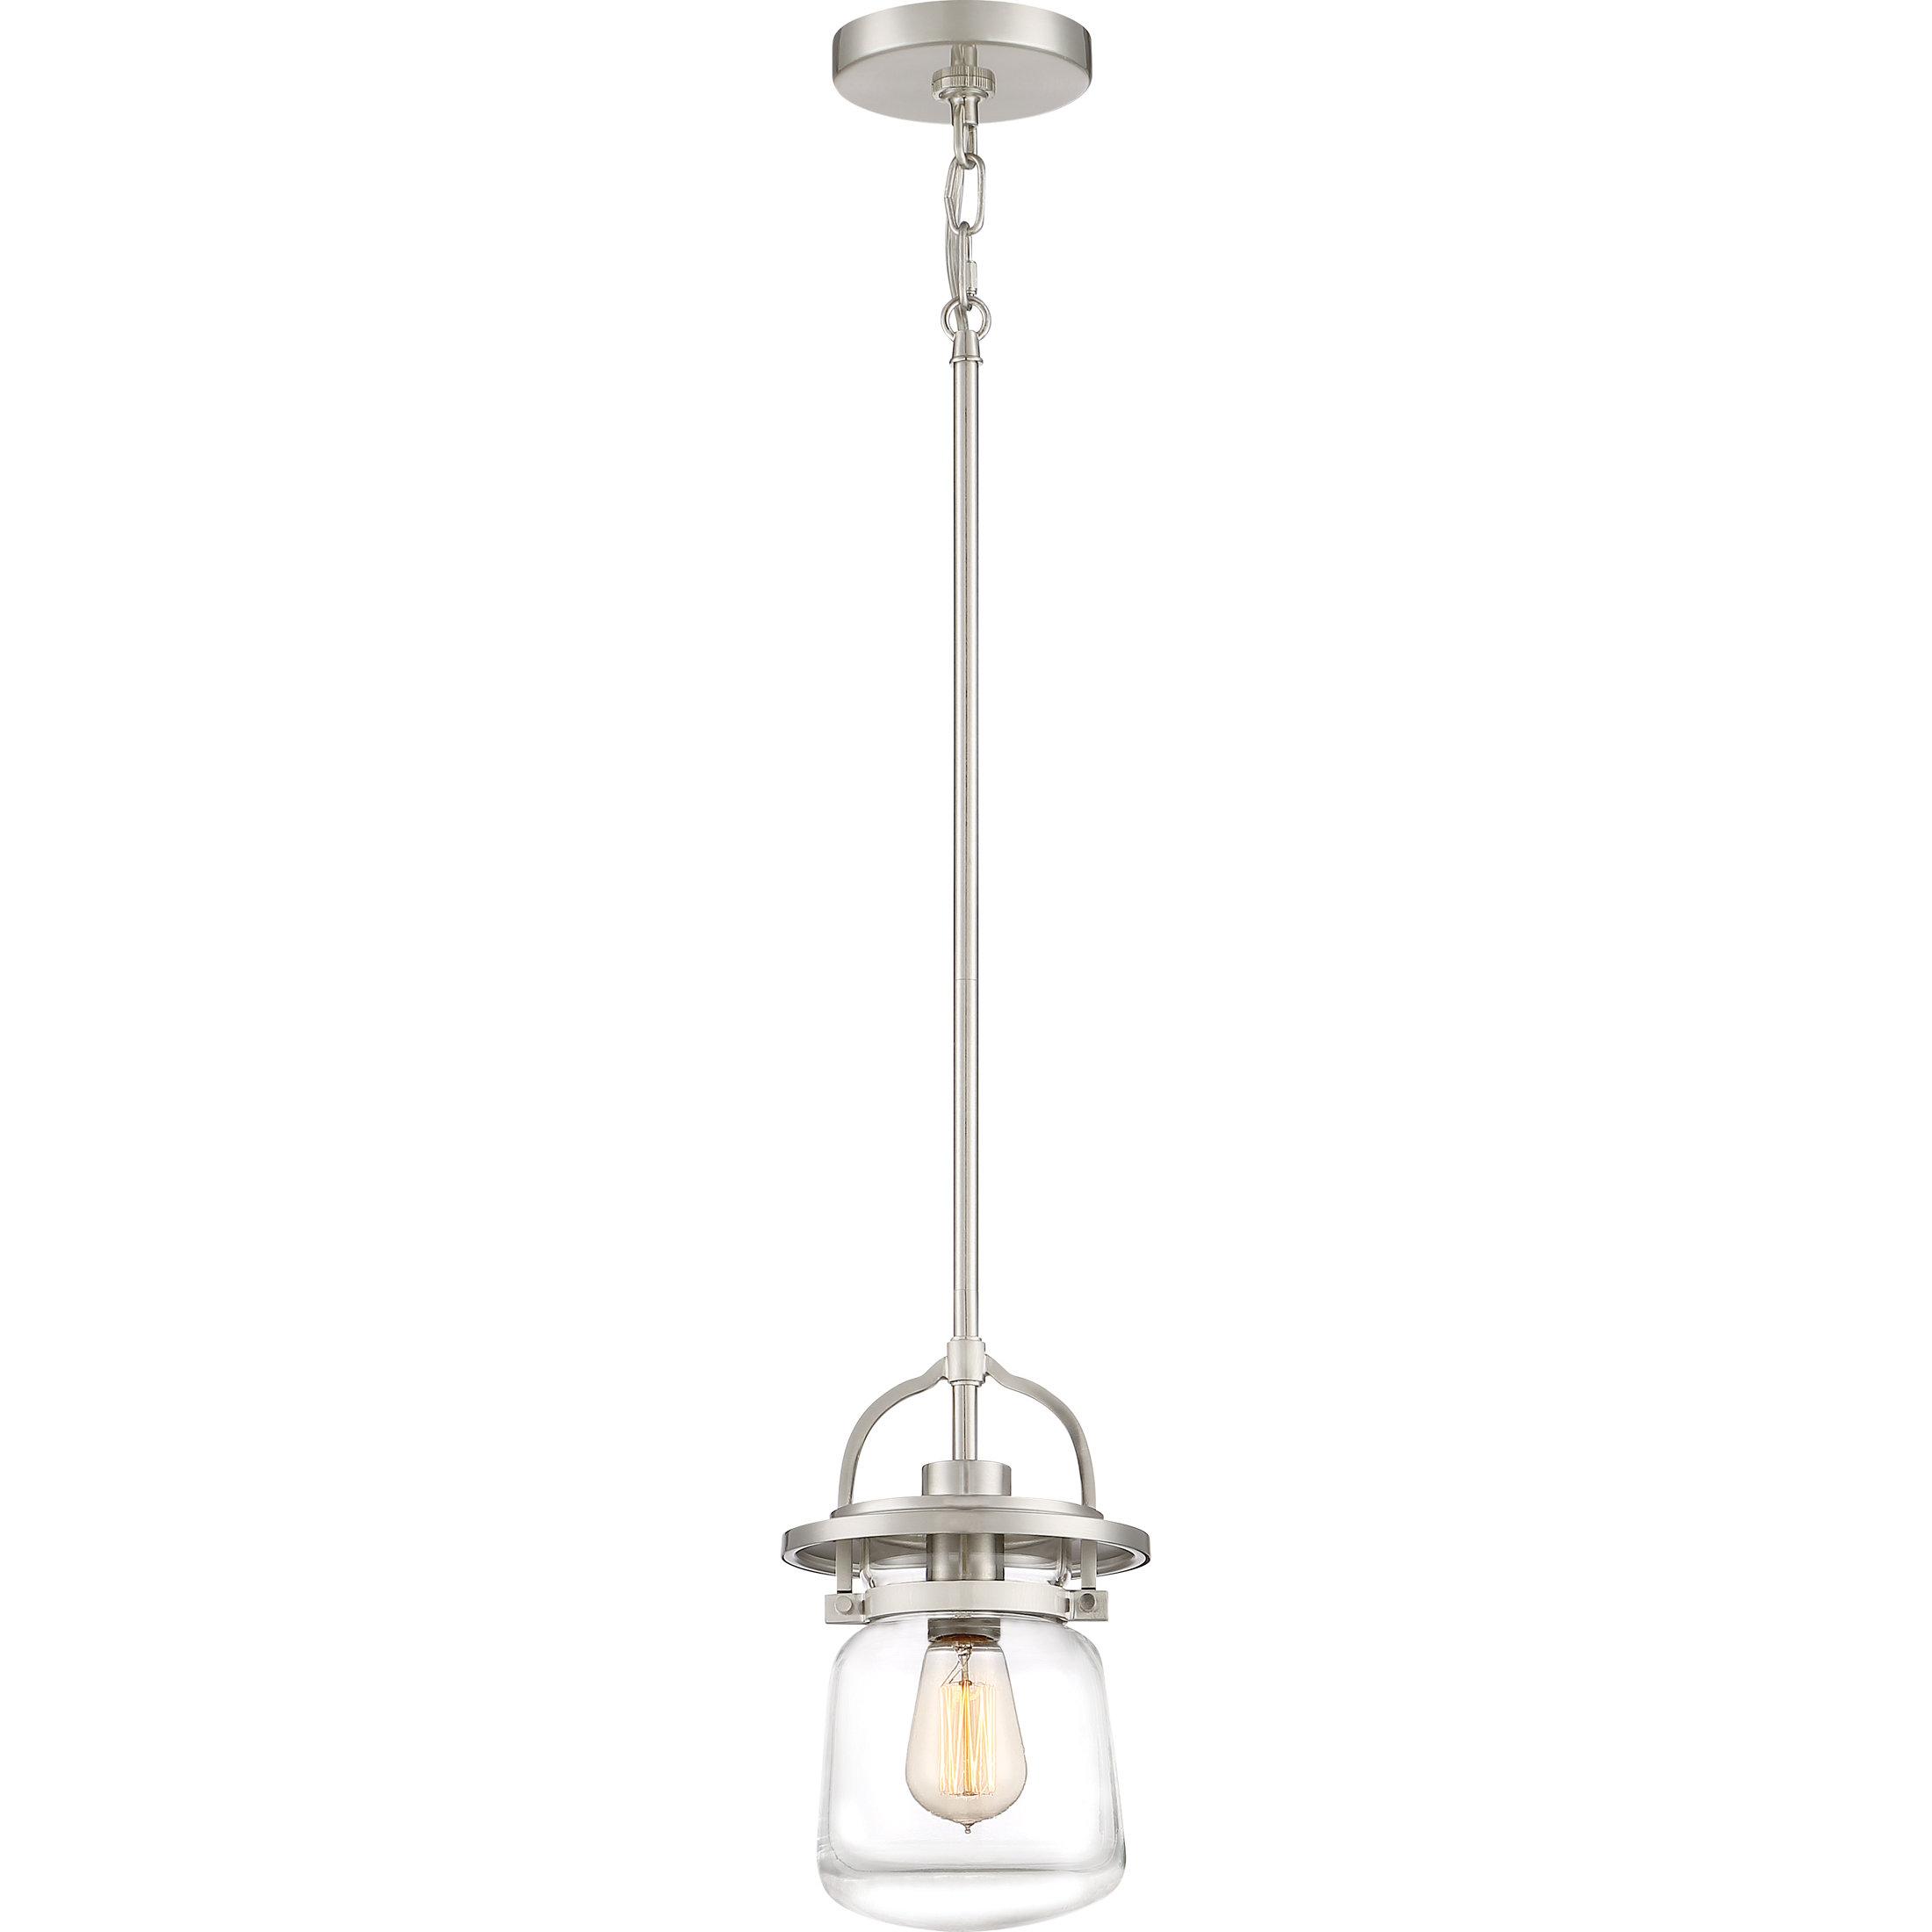 Most Popular Roslindale 1 Light Single Bell Pendants In Dickerson 1 Light Single Jar Pendant (View 15 of 25)